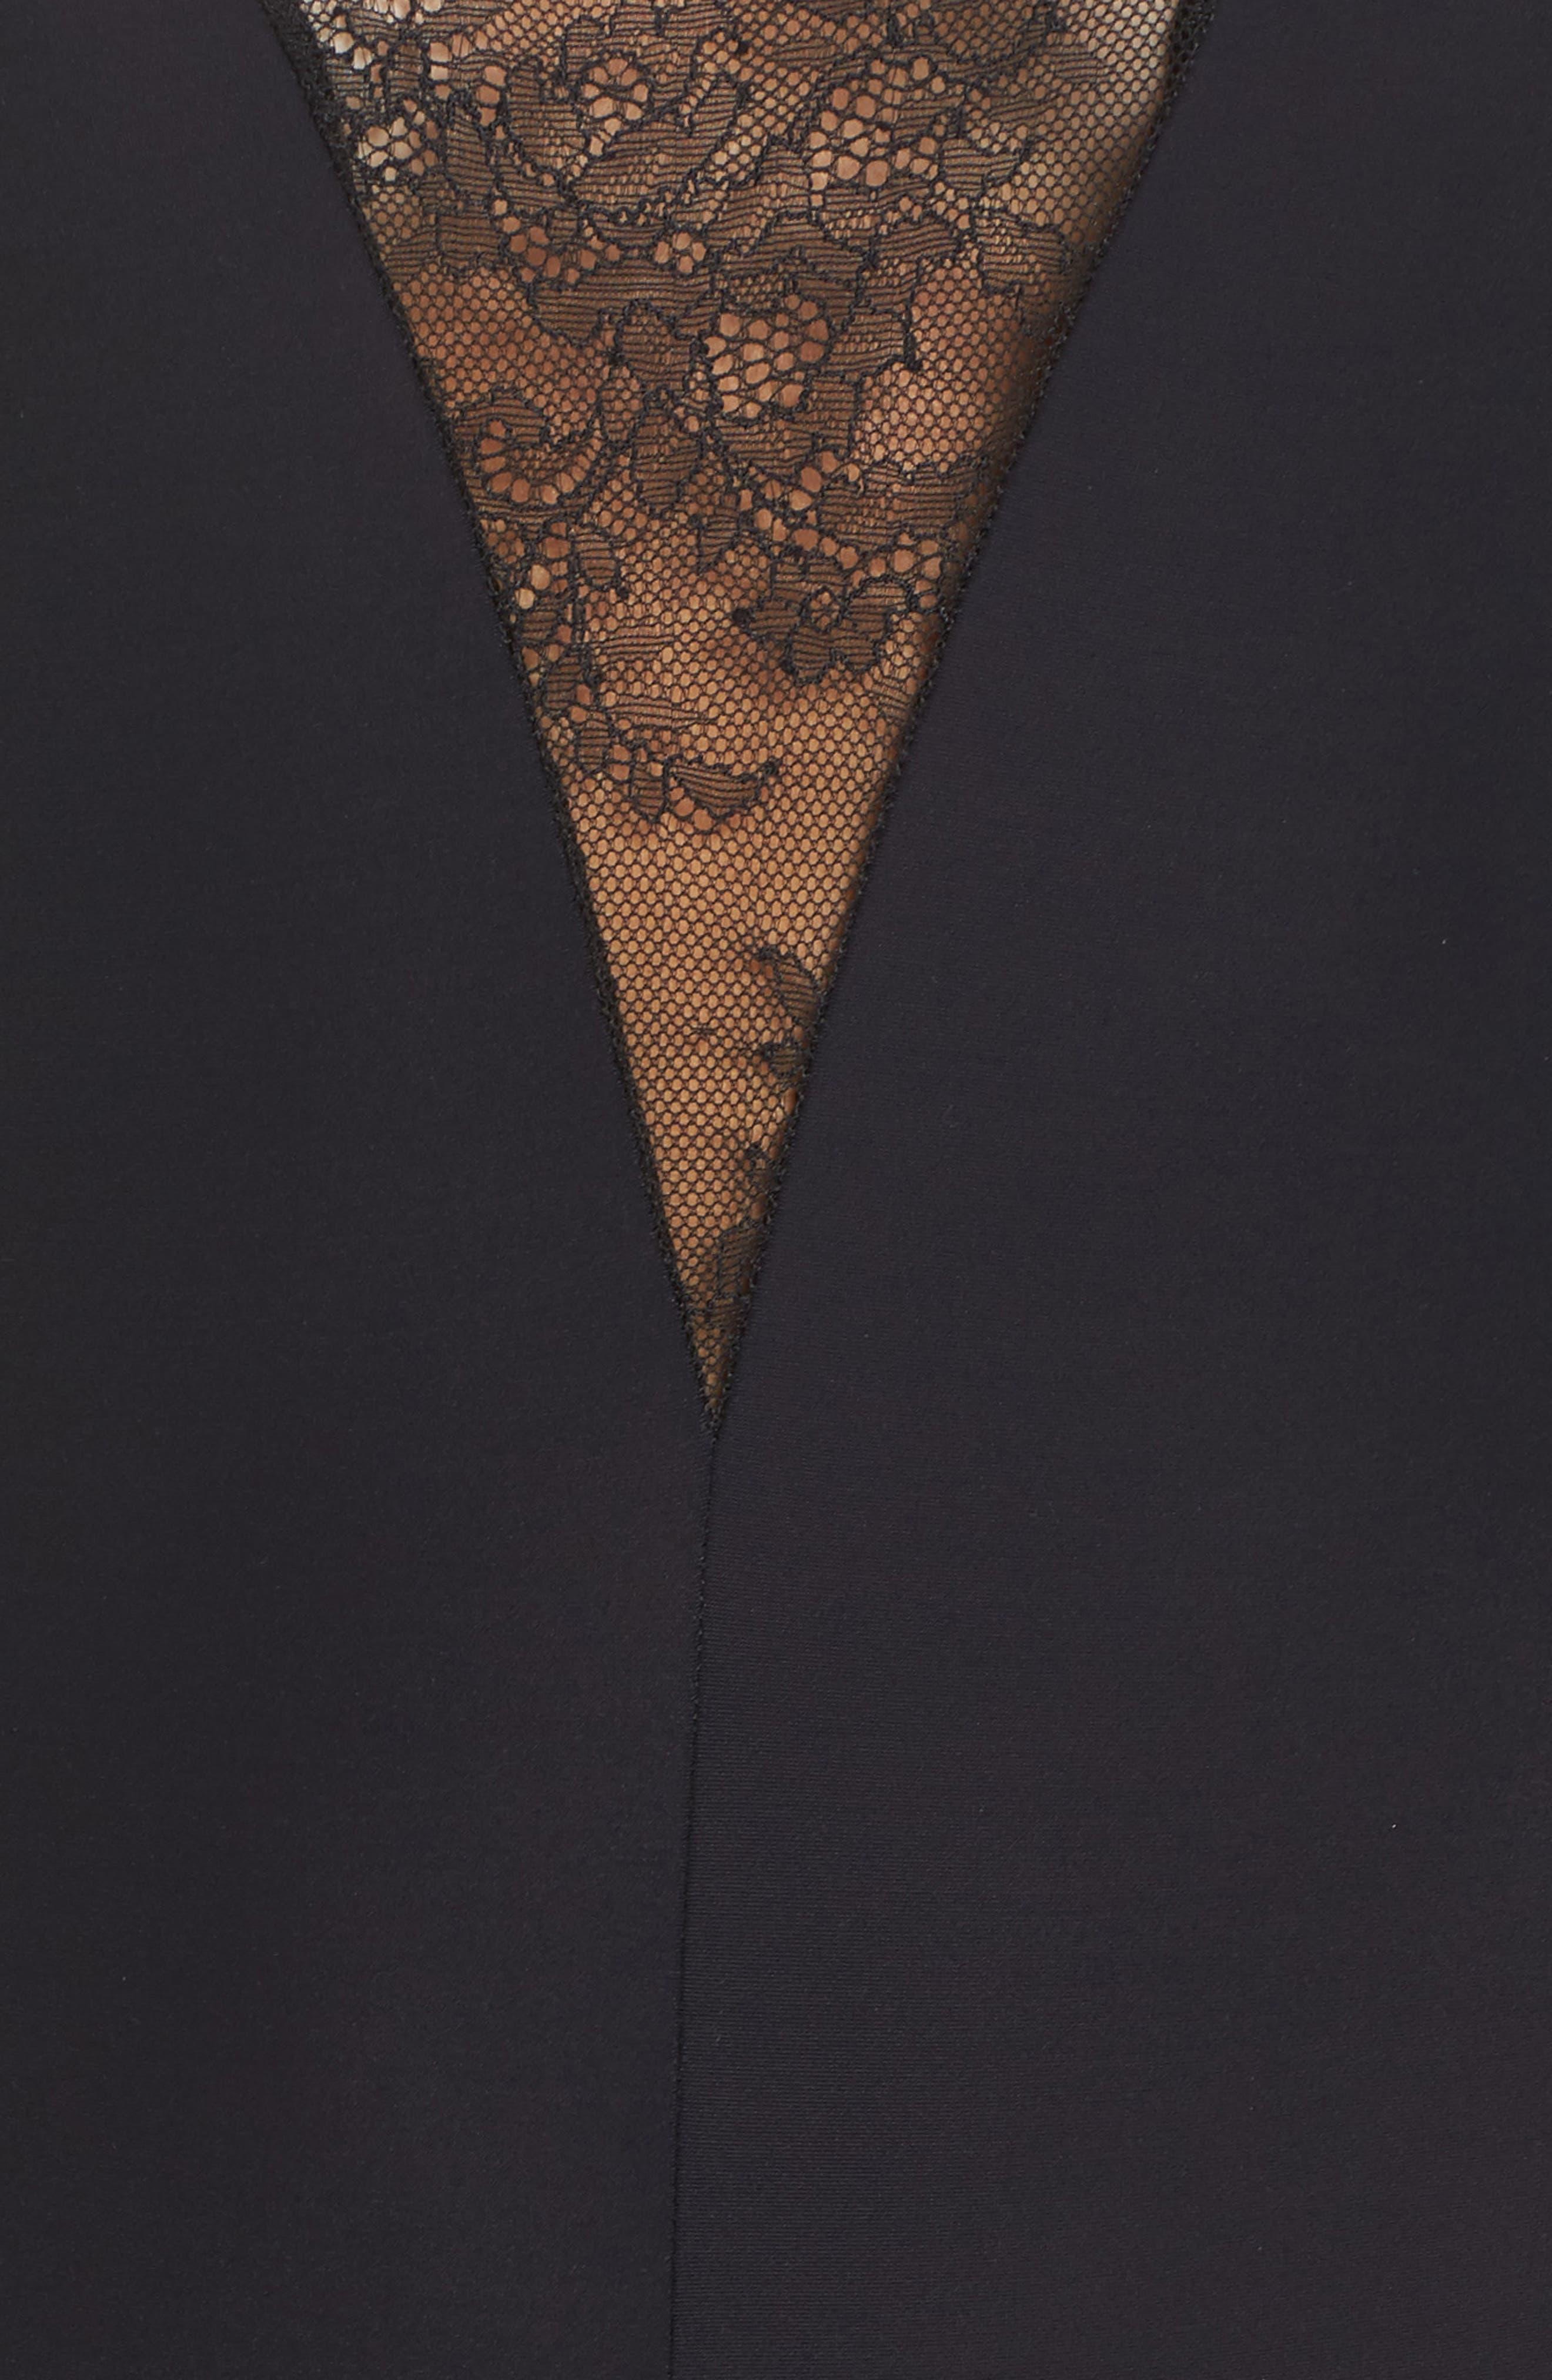 Odette Bodysuit,                             Alternate thumbnail 6, color,                             Black